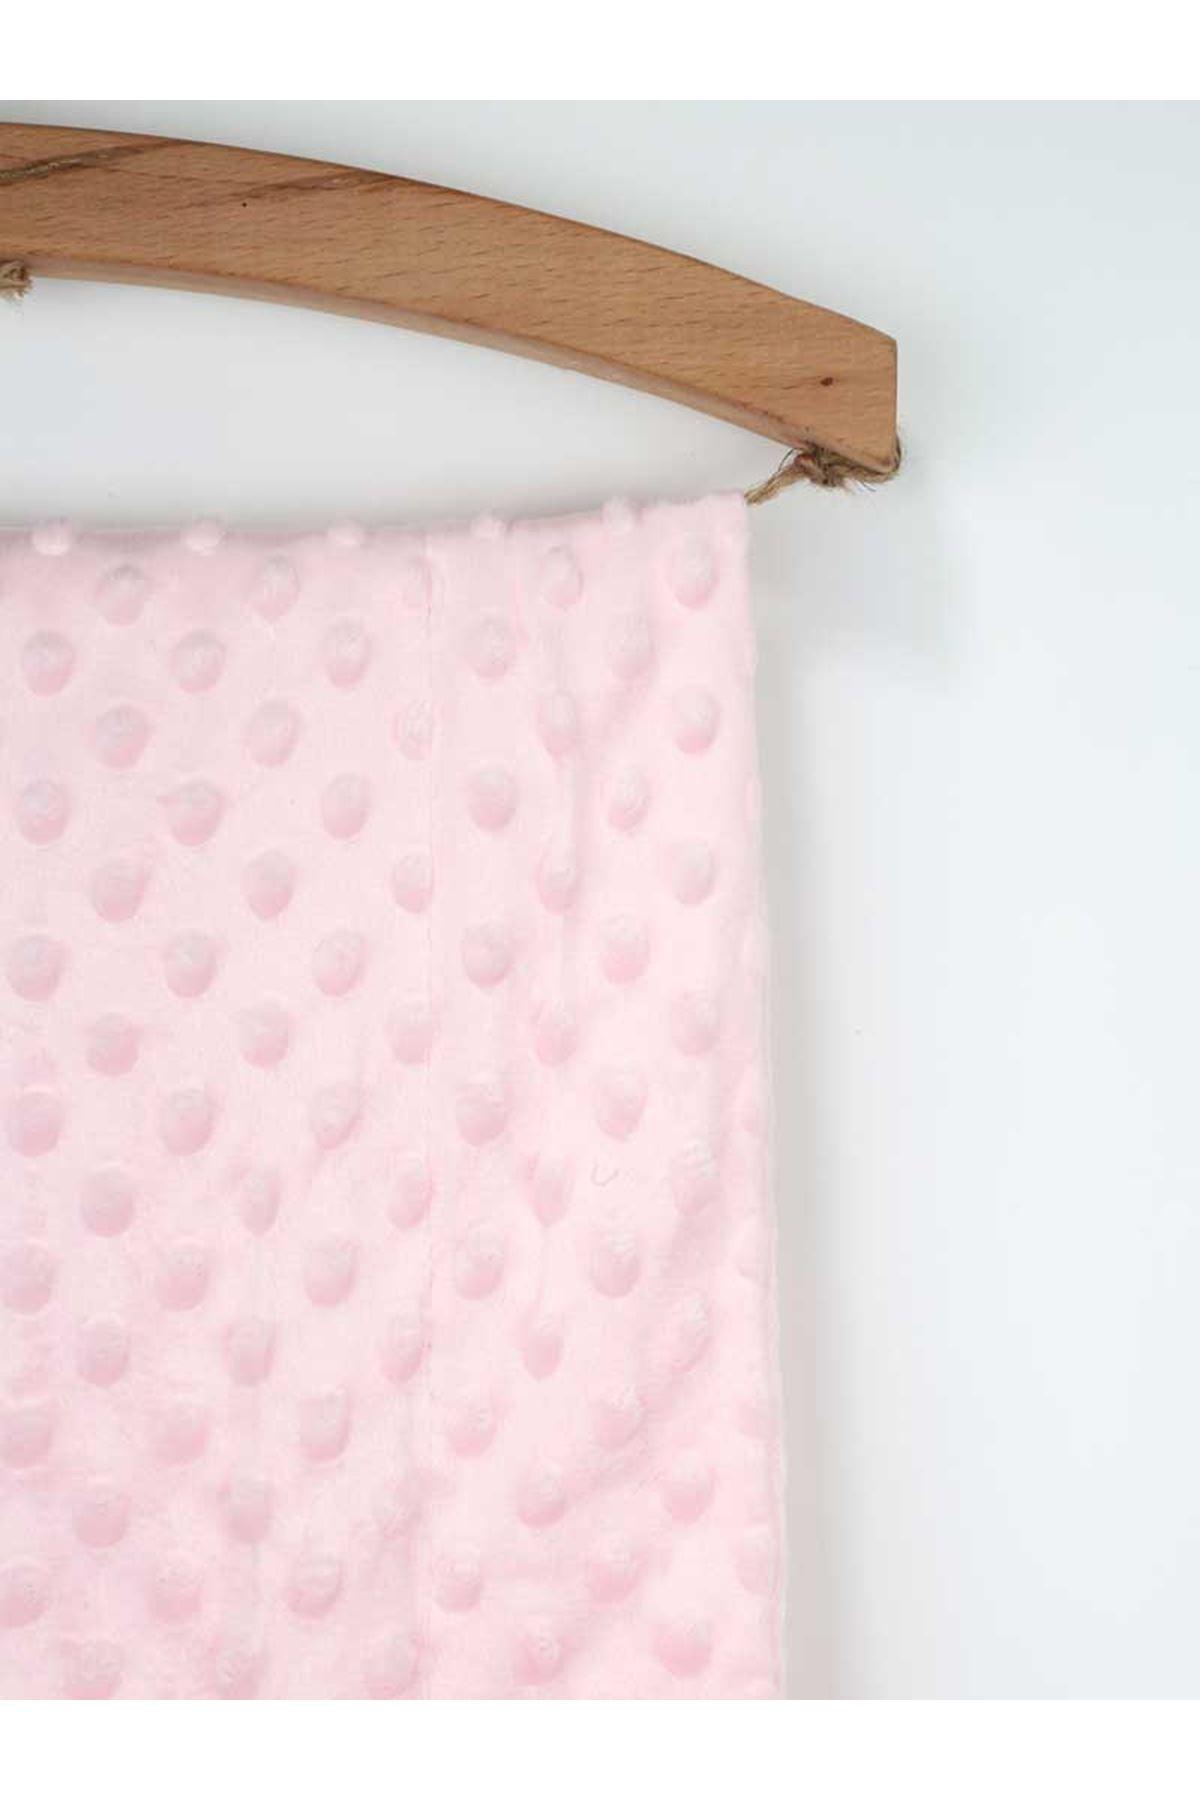 Pink Girls Baby Blanket Embossed Chickpea Swaddle Blanket Cotton Soft babies Comfortable Sweatproof Antiallergic Baby Stroller